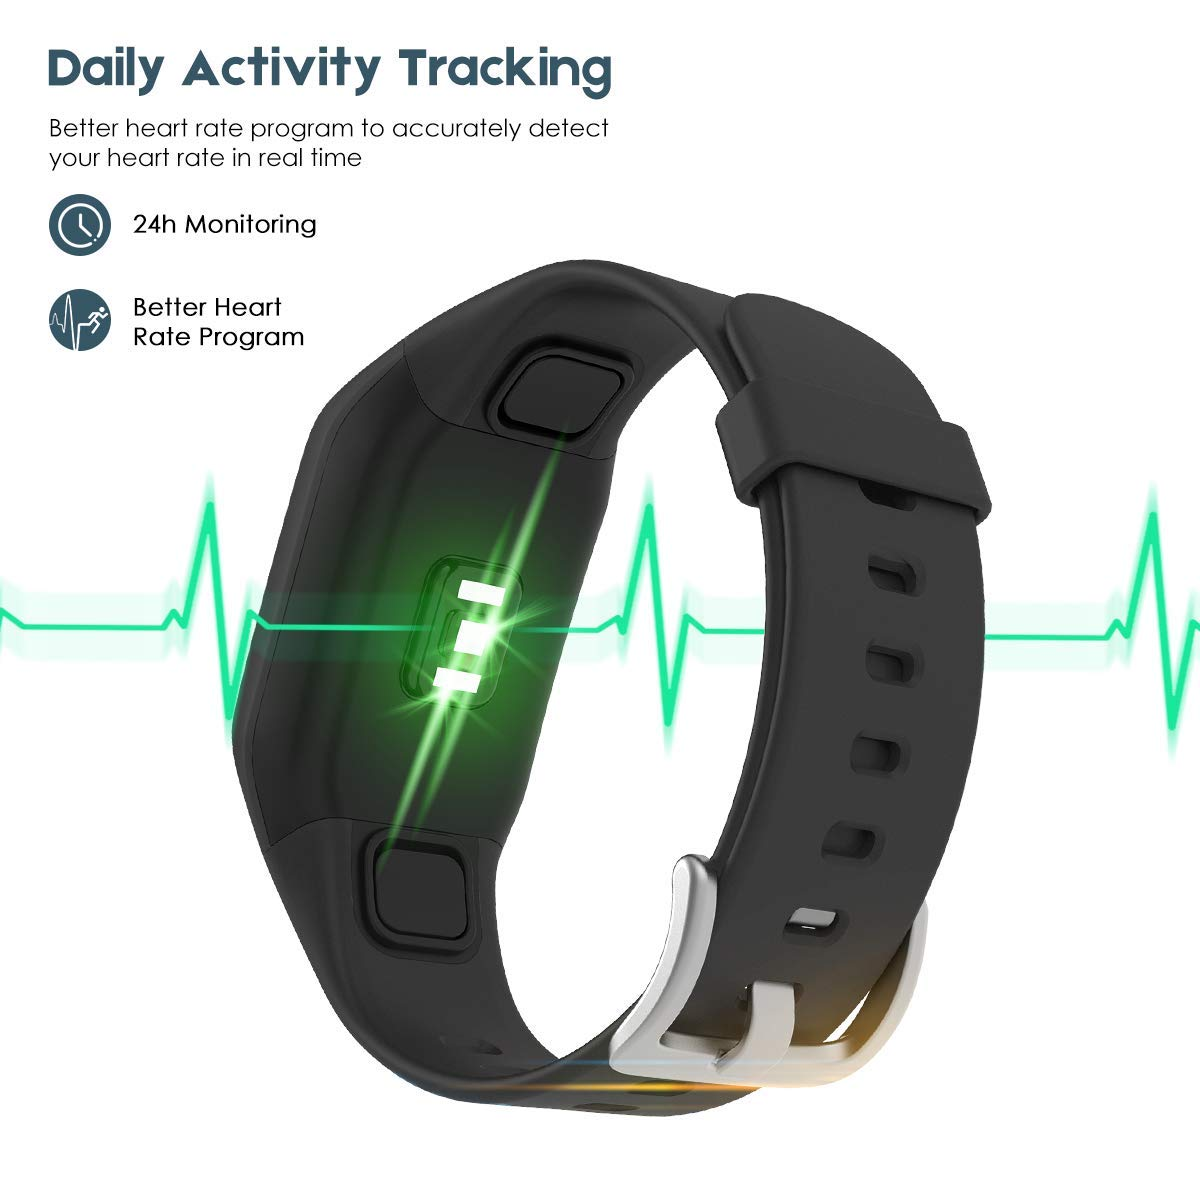 Amazon.com: Coffea Fitness Tracker, Activity Tracker Watch ...